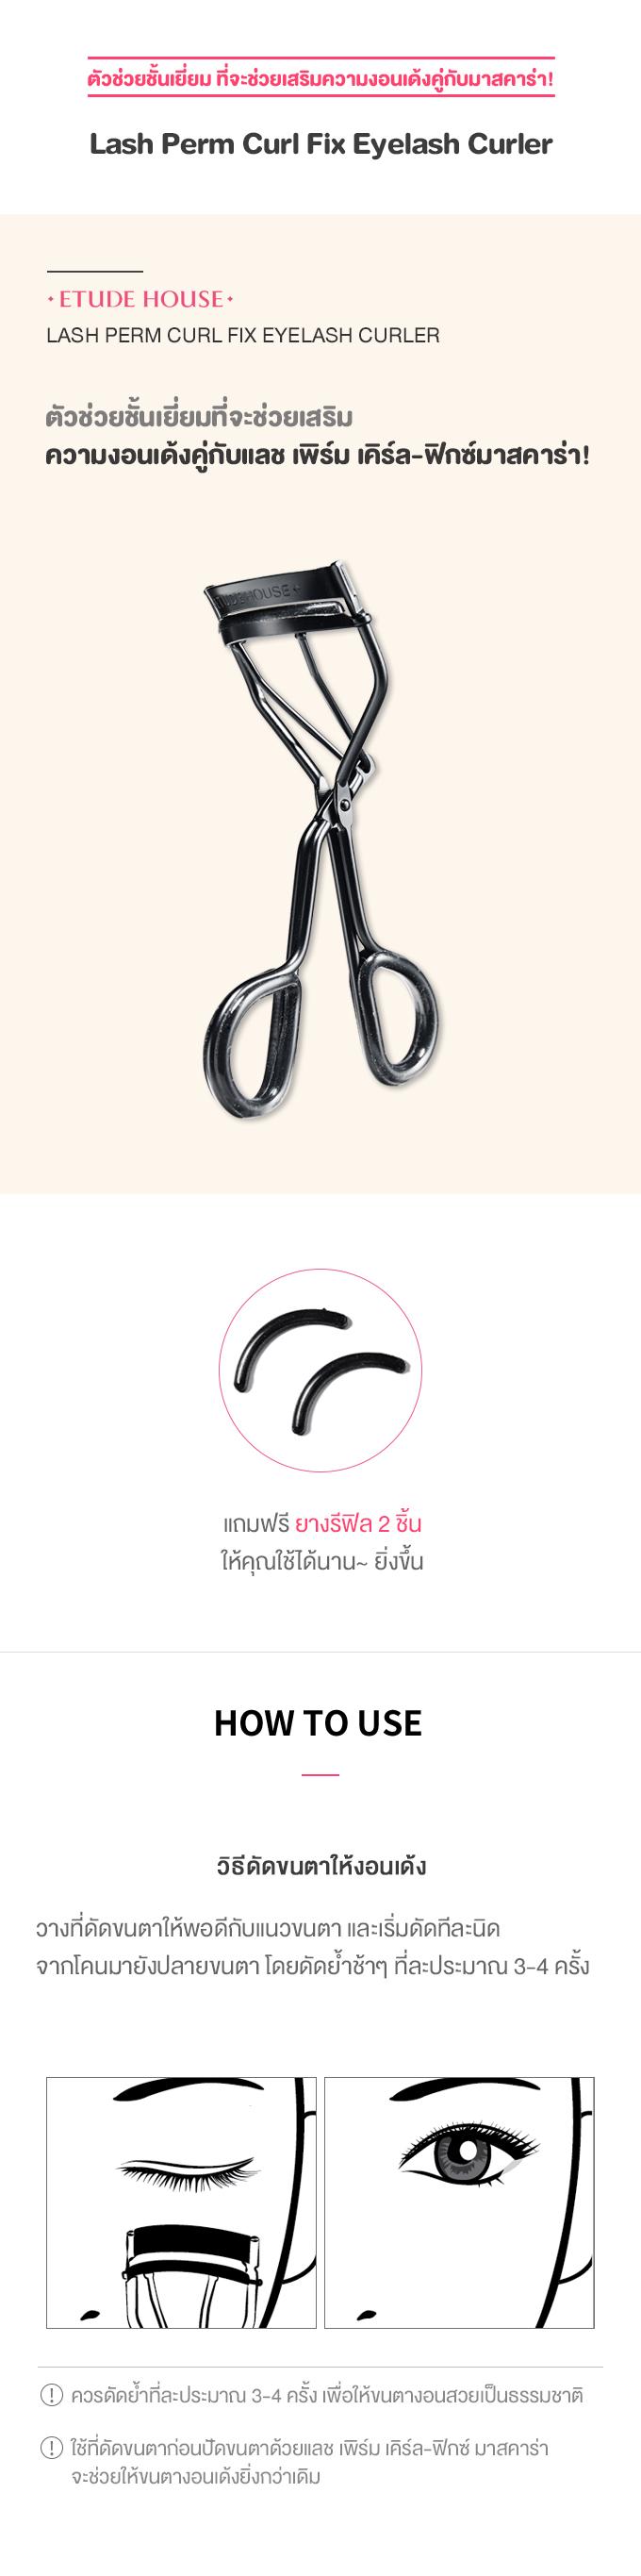 Lash Perm Curl Fix Eyelash Curler